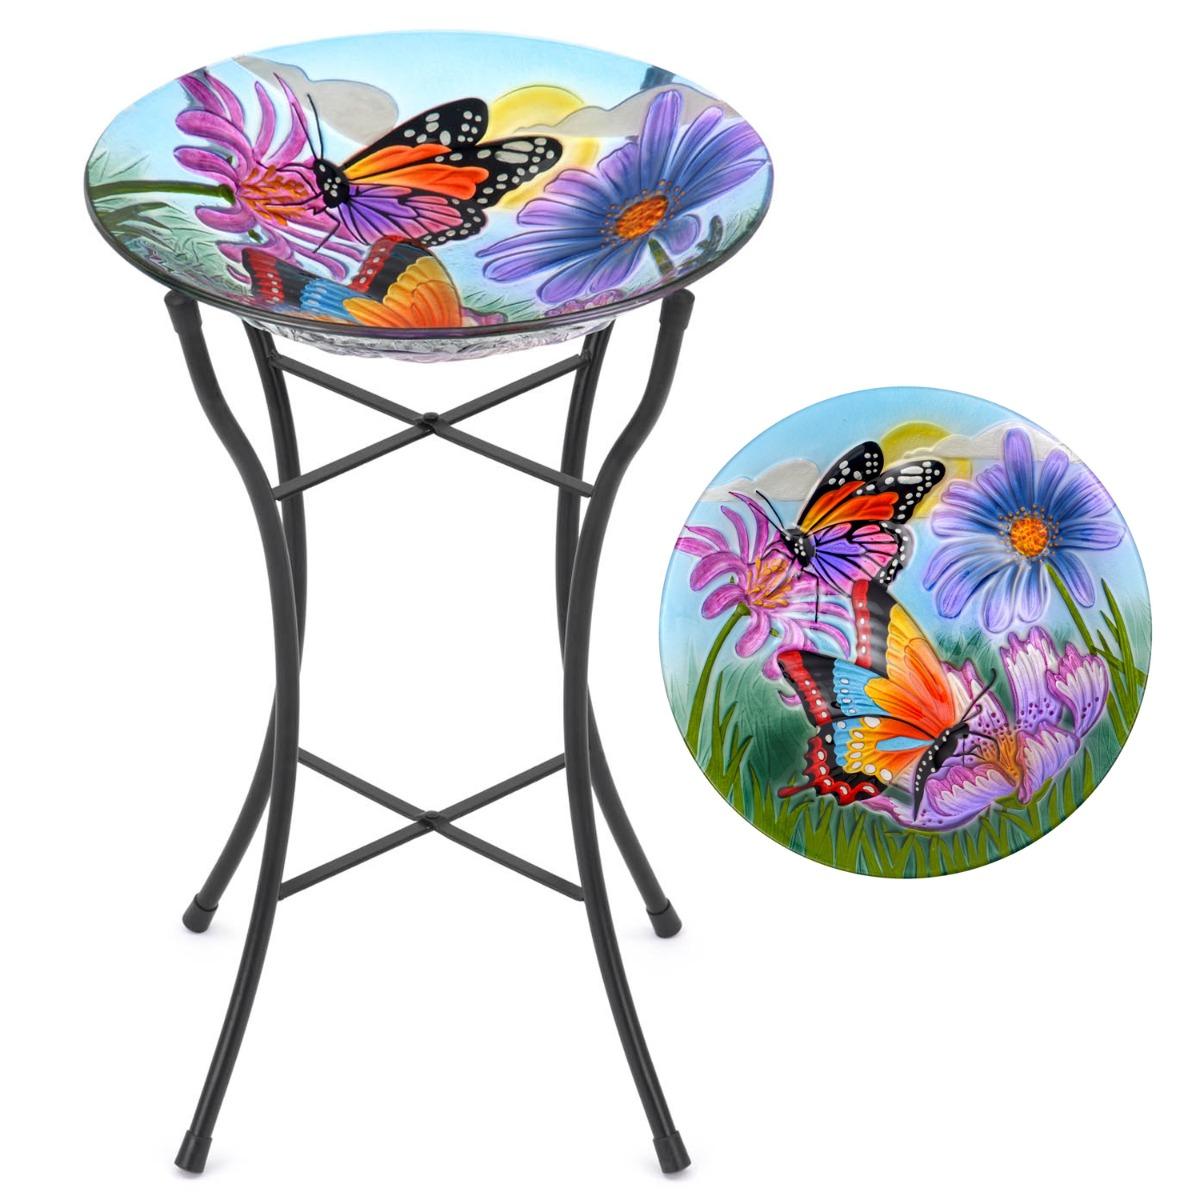 Image of Glass Butterfly Bird Bath